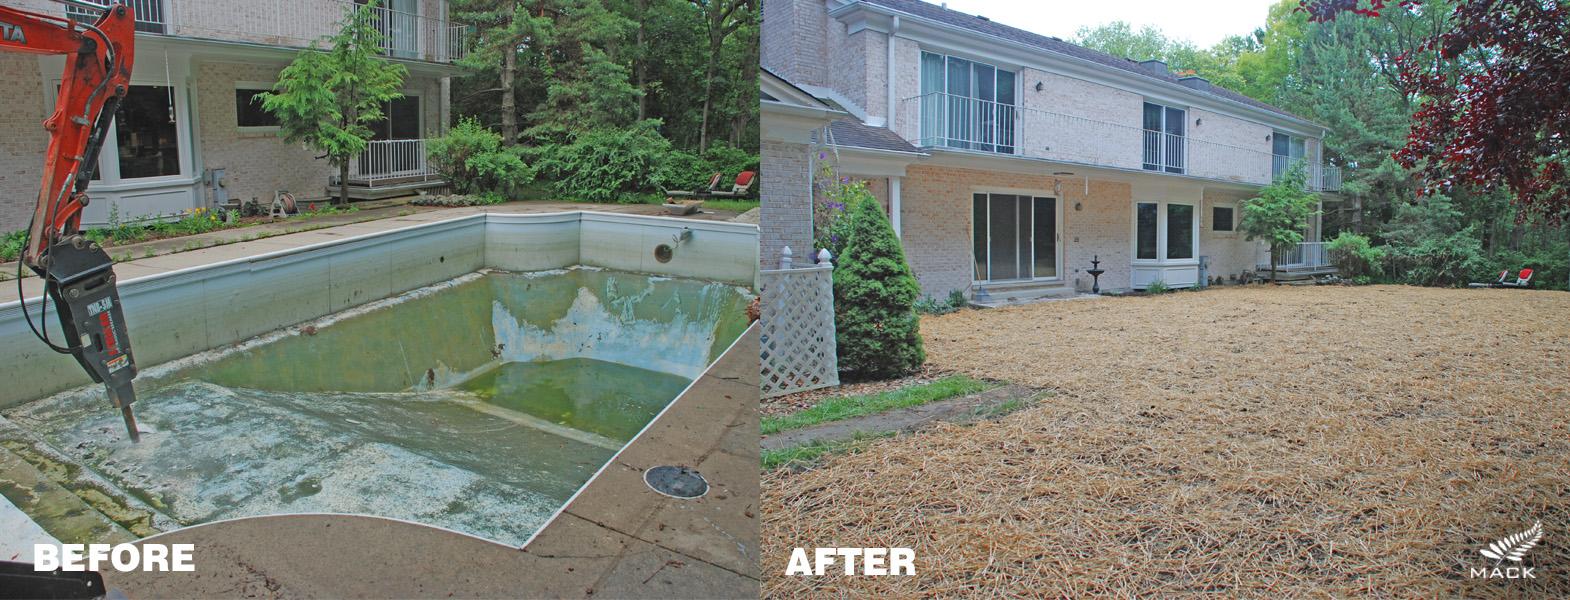 Mack Land LLC - Lake Forest, IL Pool Removal